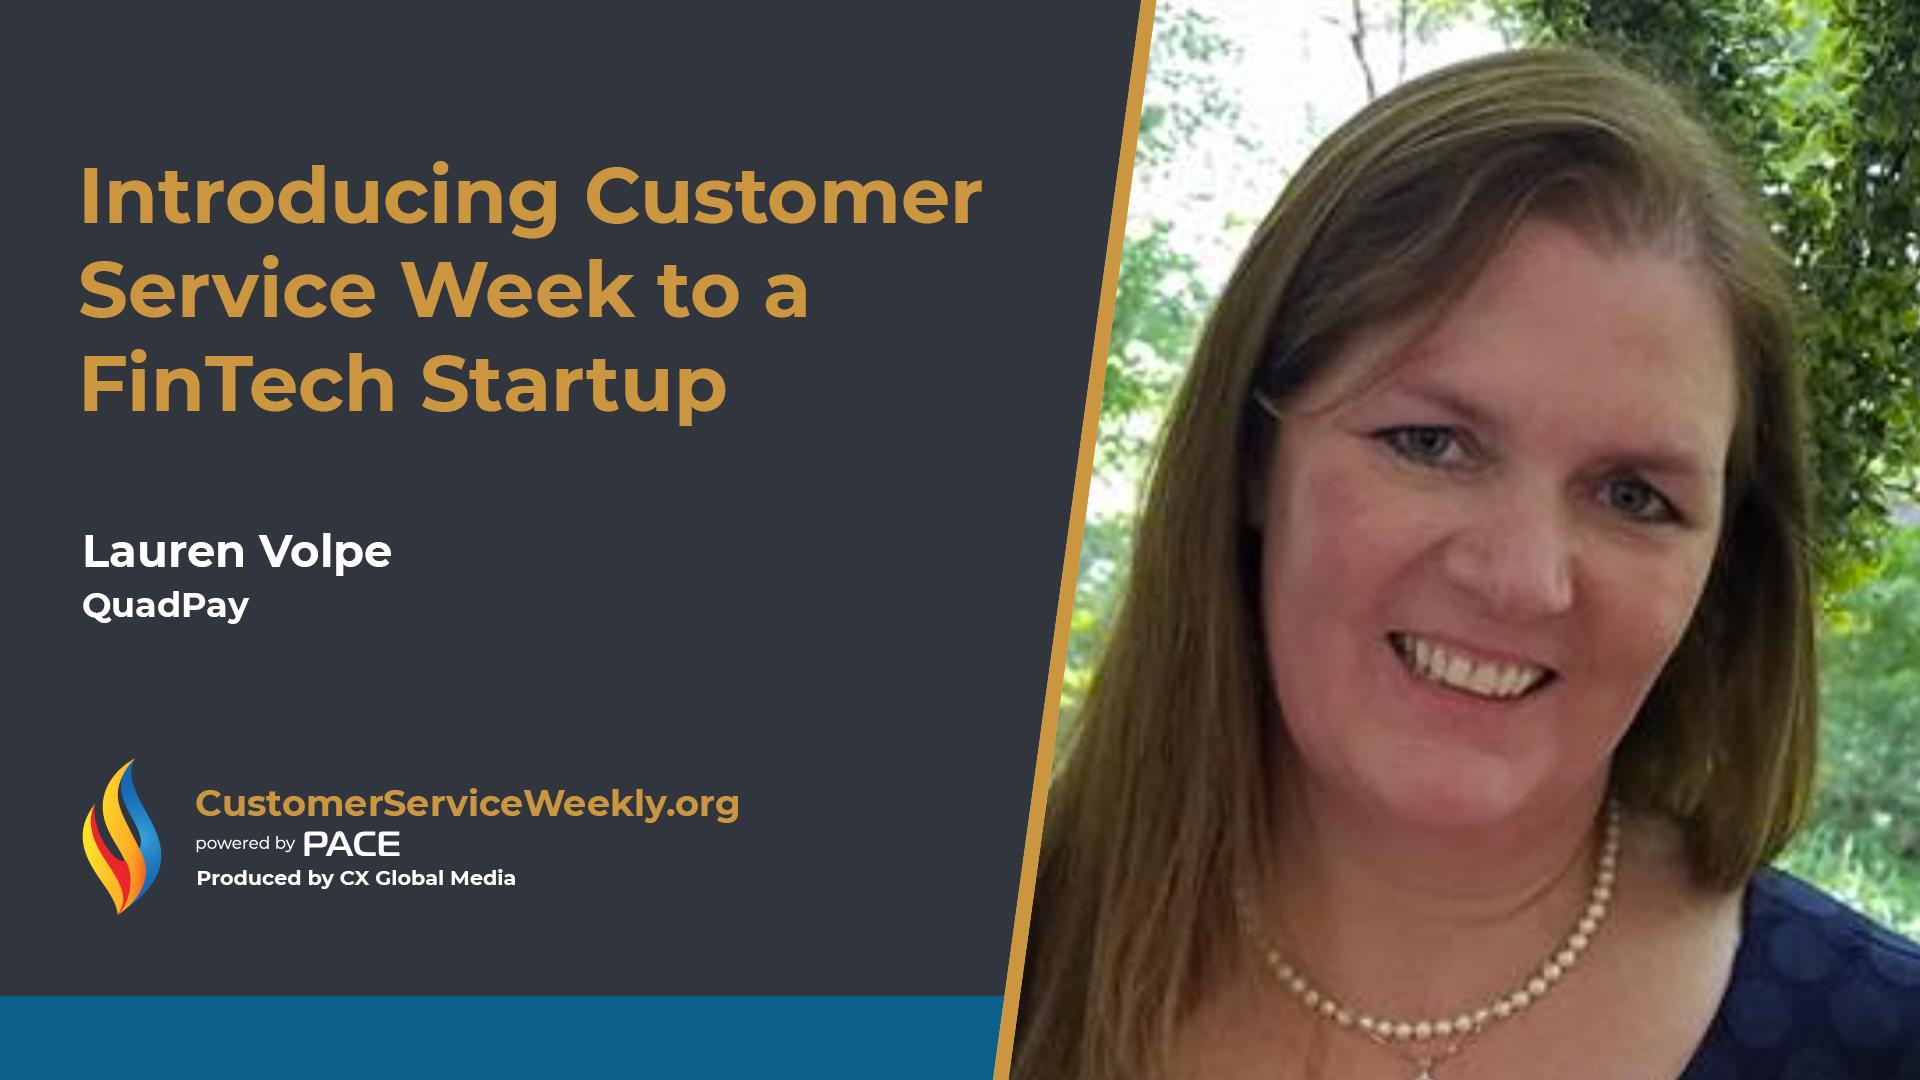 Lauren Volpe – QuadPay: Introducing Customer Service Week to a FinTech Startup